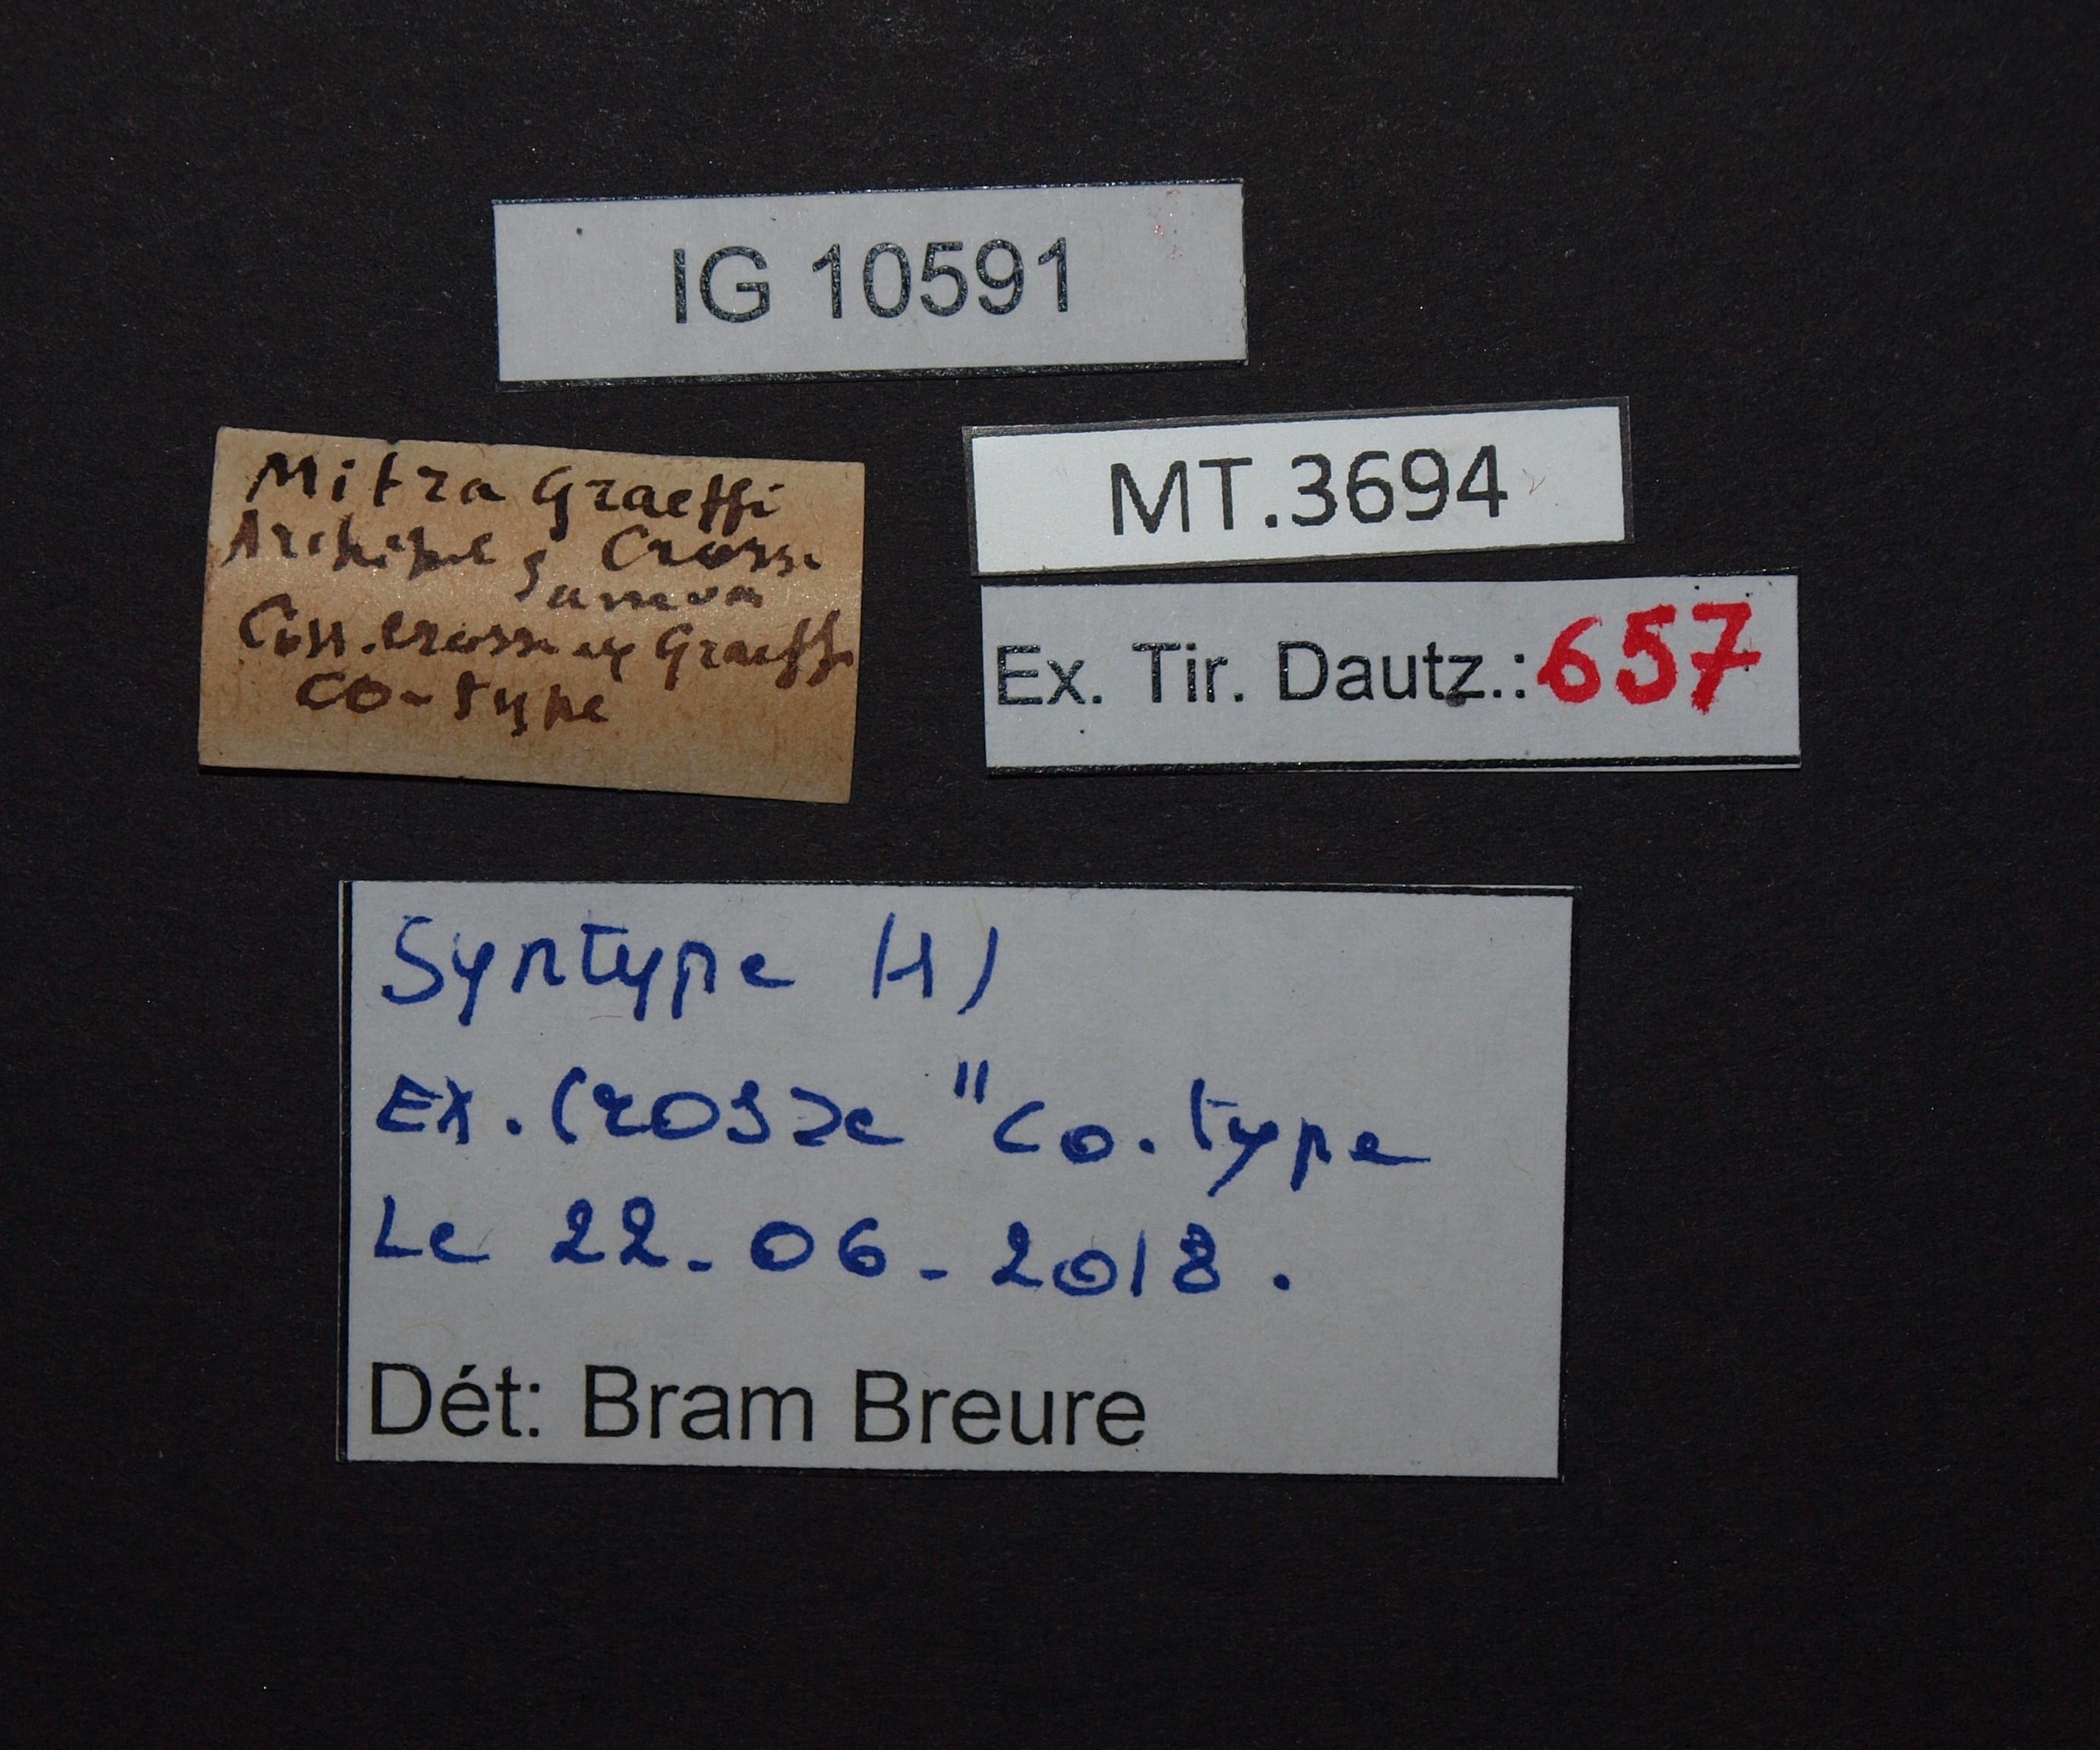 BE-RBINS-INV MT.3694 Mitra graeffi st Lb.jpg